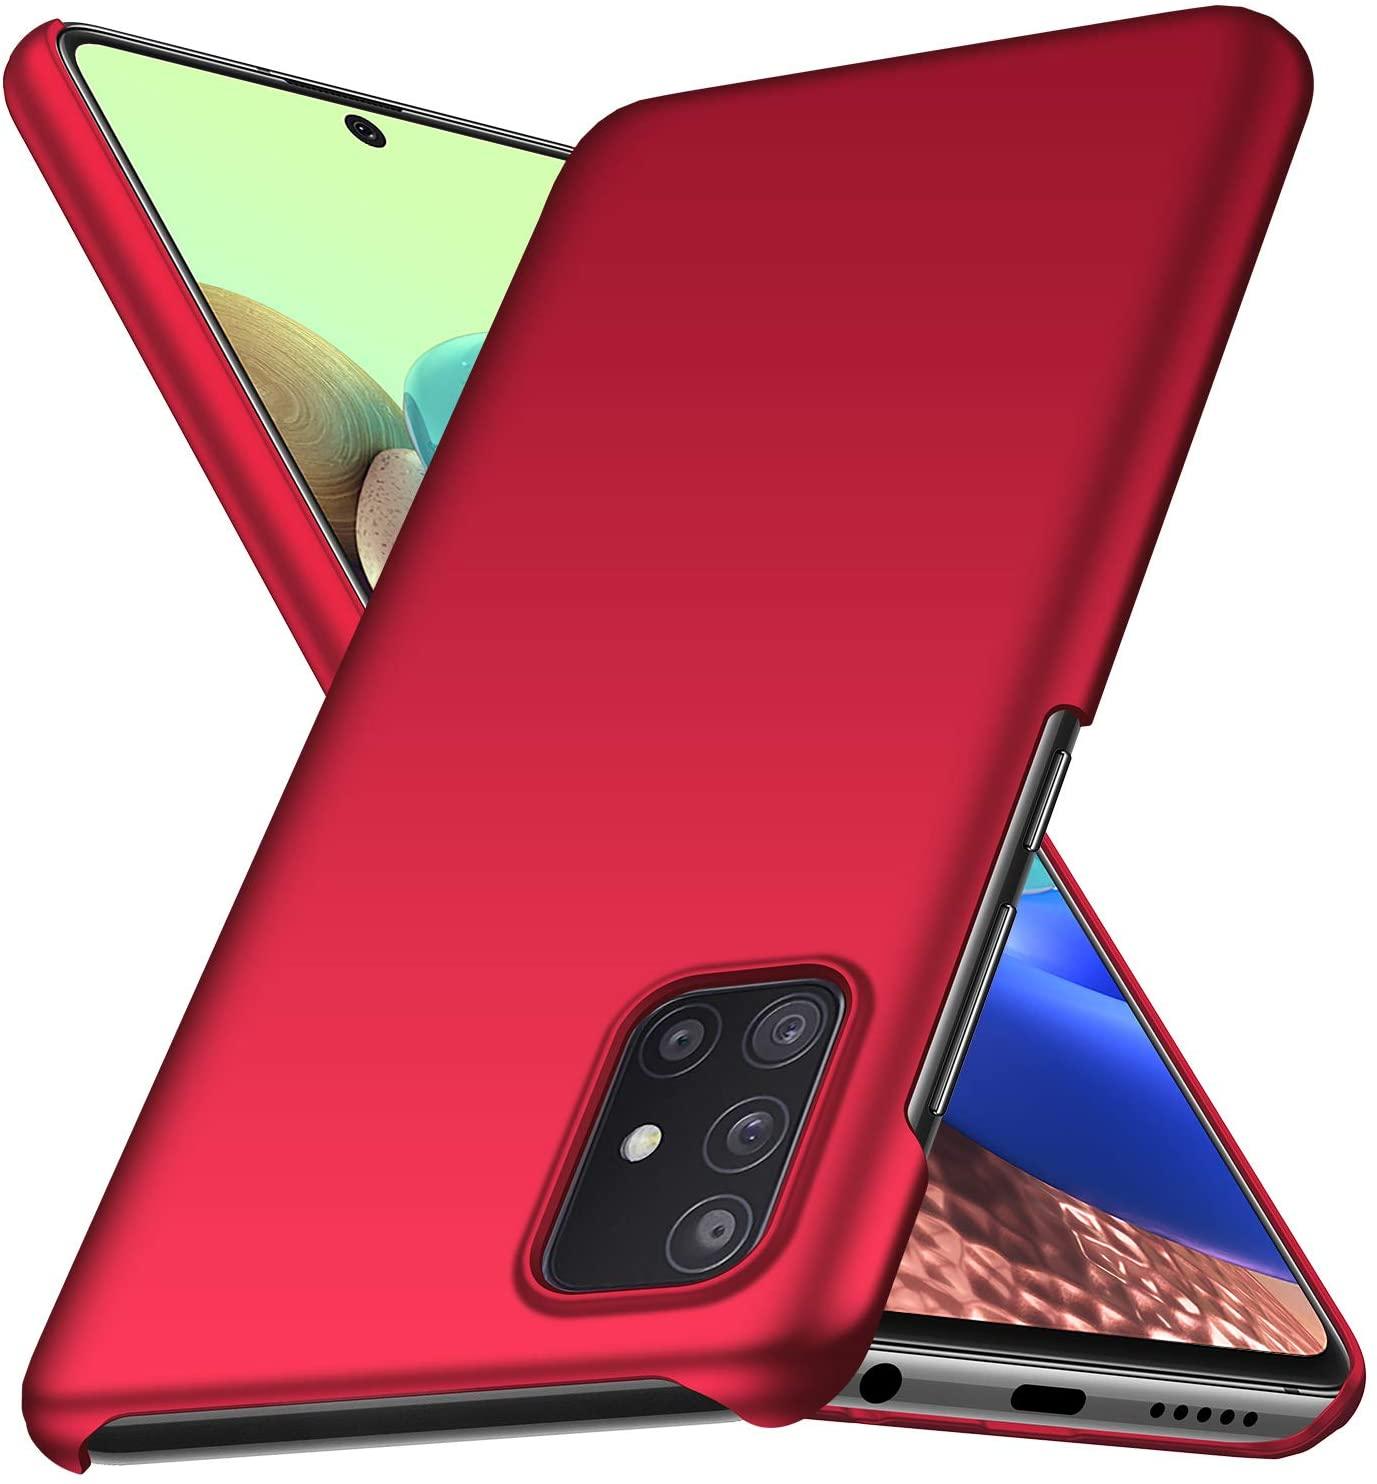 Banzn Case for Samsung Galaxy A71 5G,Slim Matte Anti-Fingerprint and Minimalist Hard PC Cover for Samsung Galaxy A71 5G (6.7